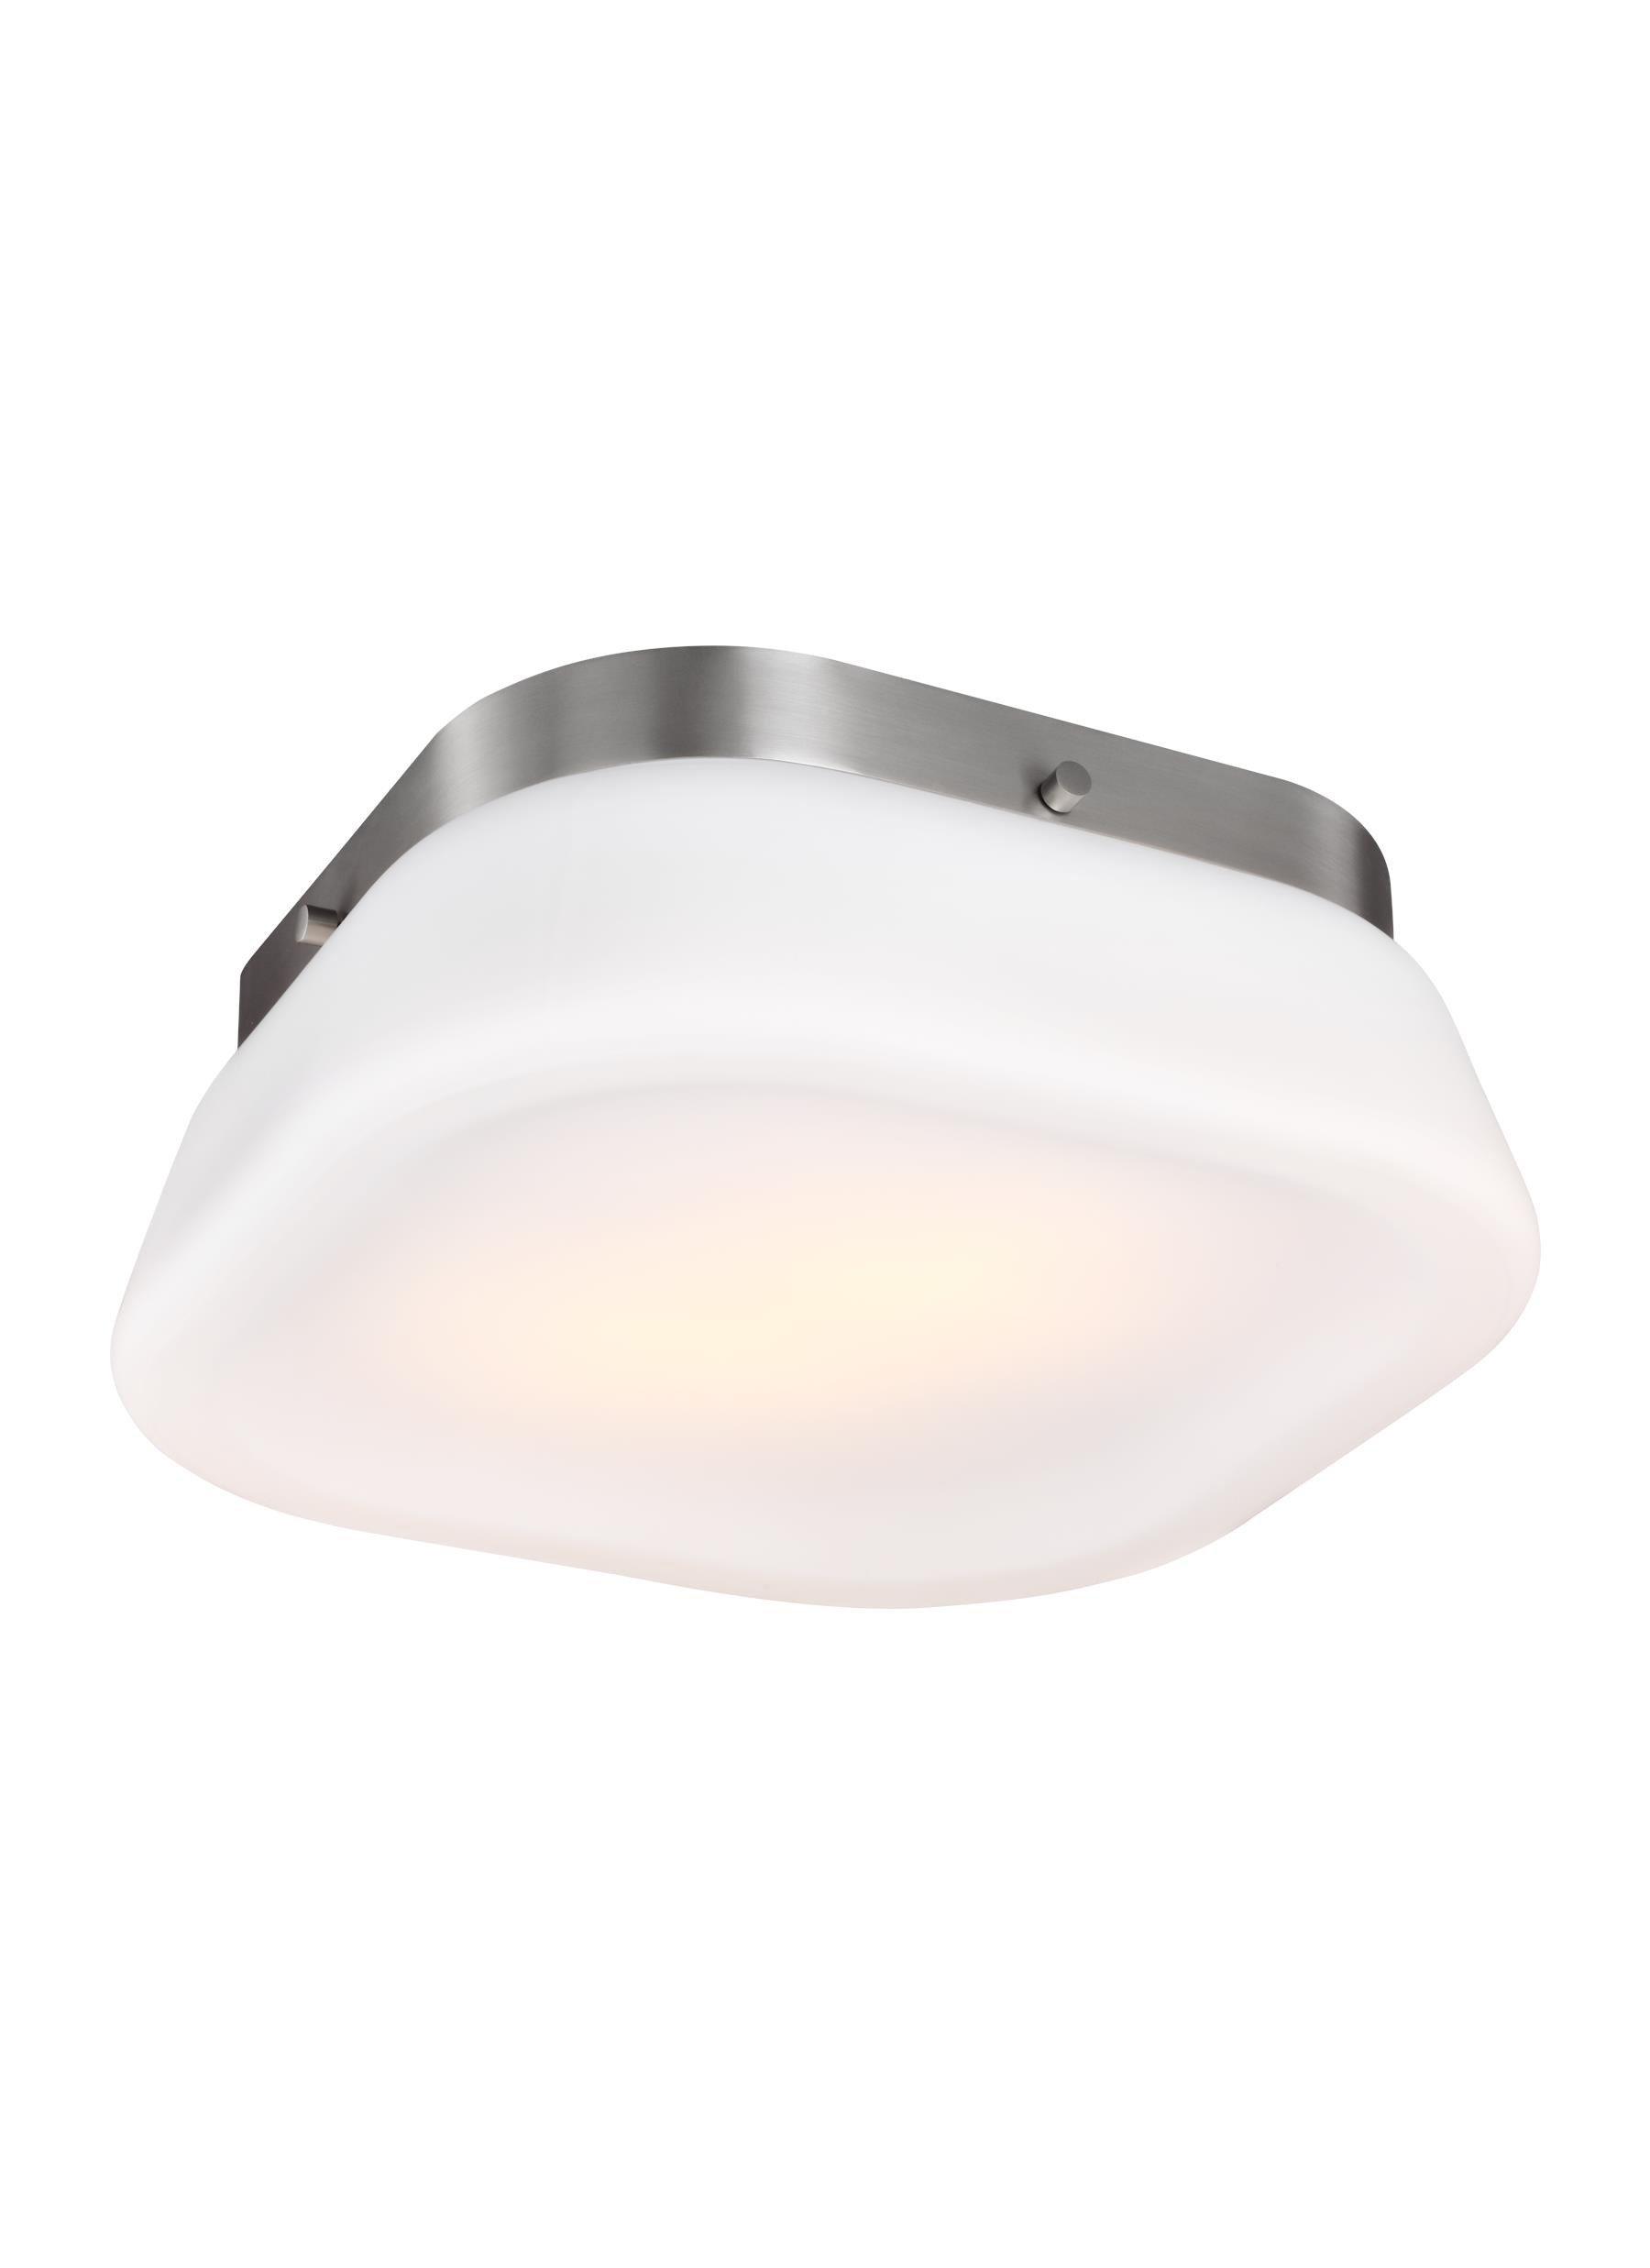 Feiss FM503SN Saul Glass Flush Mount Ceiling Lighting, Satin Nickel, 2-Light (13''Dia x 5''H) 120watts